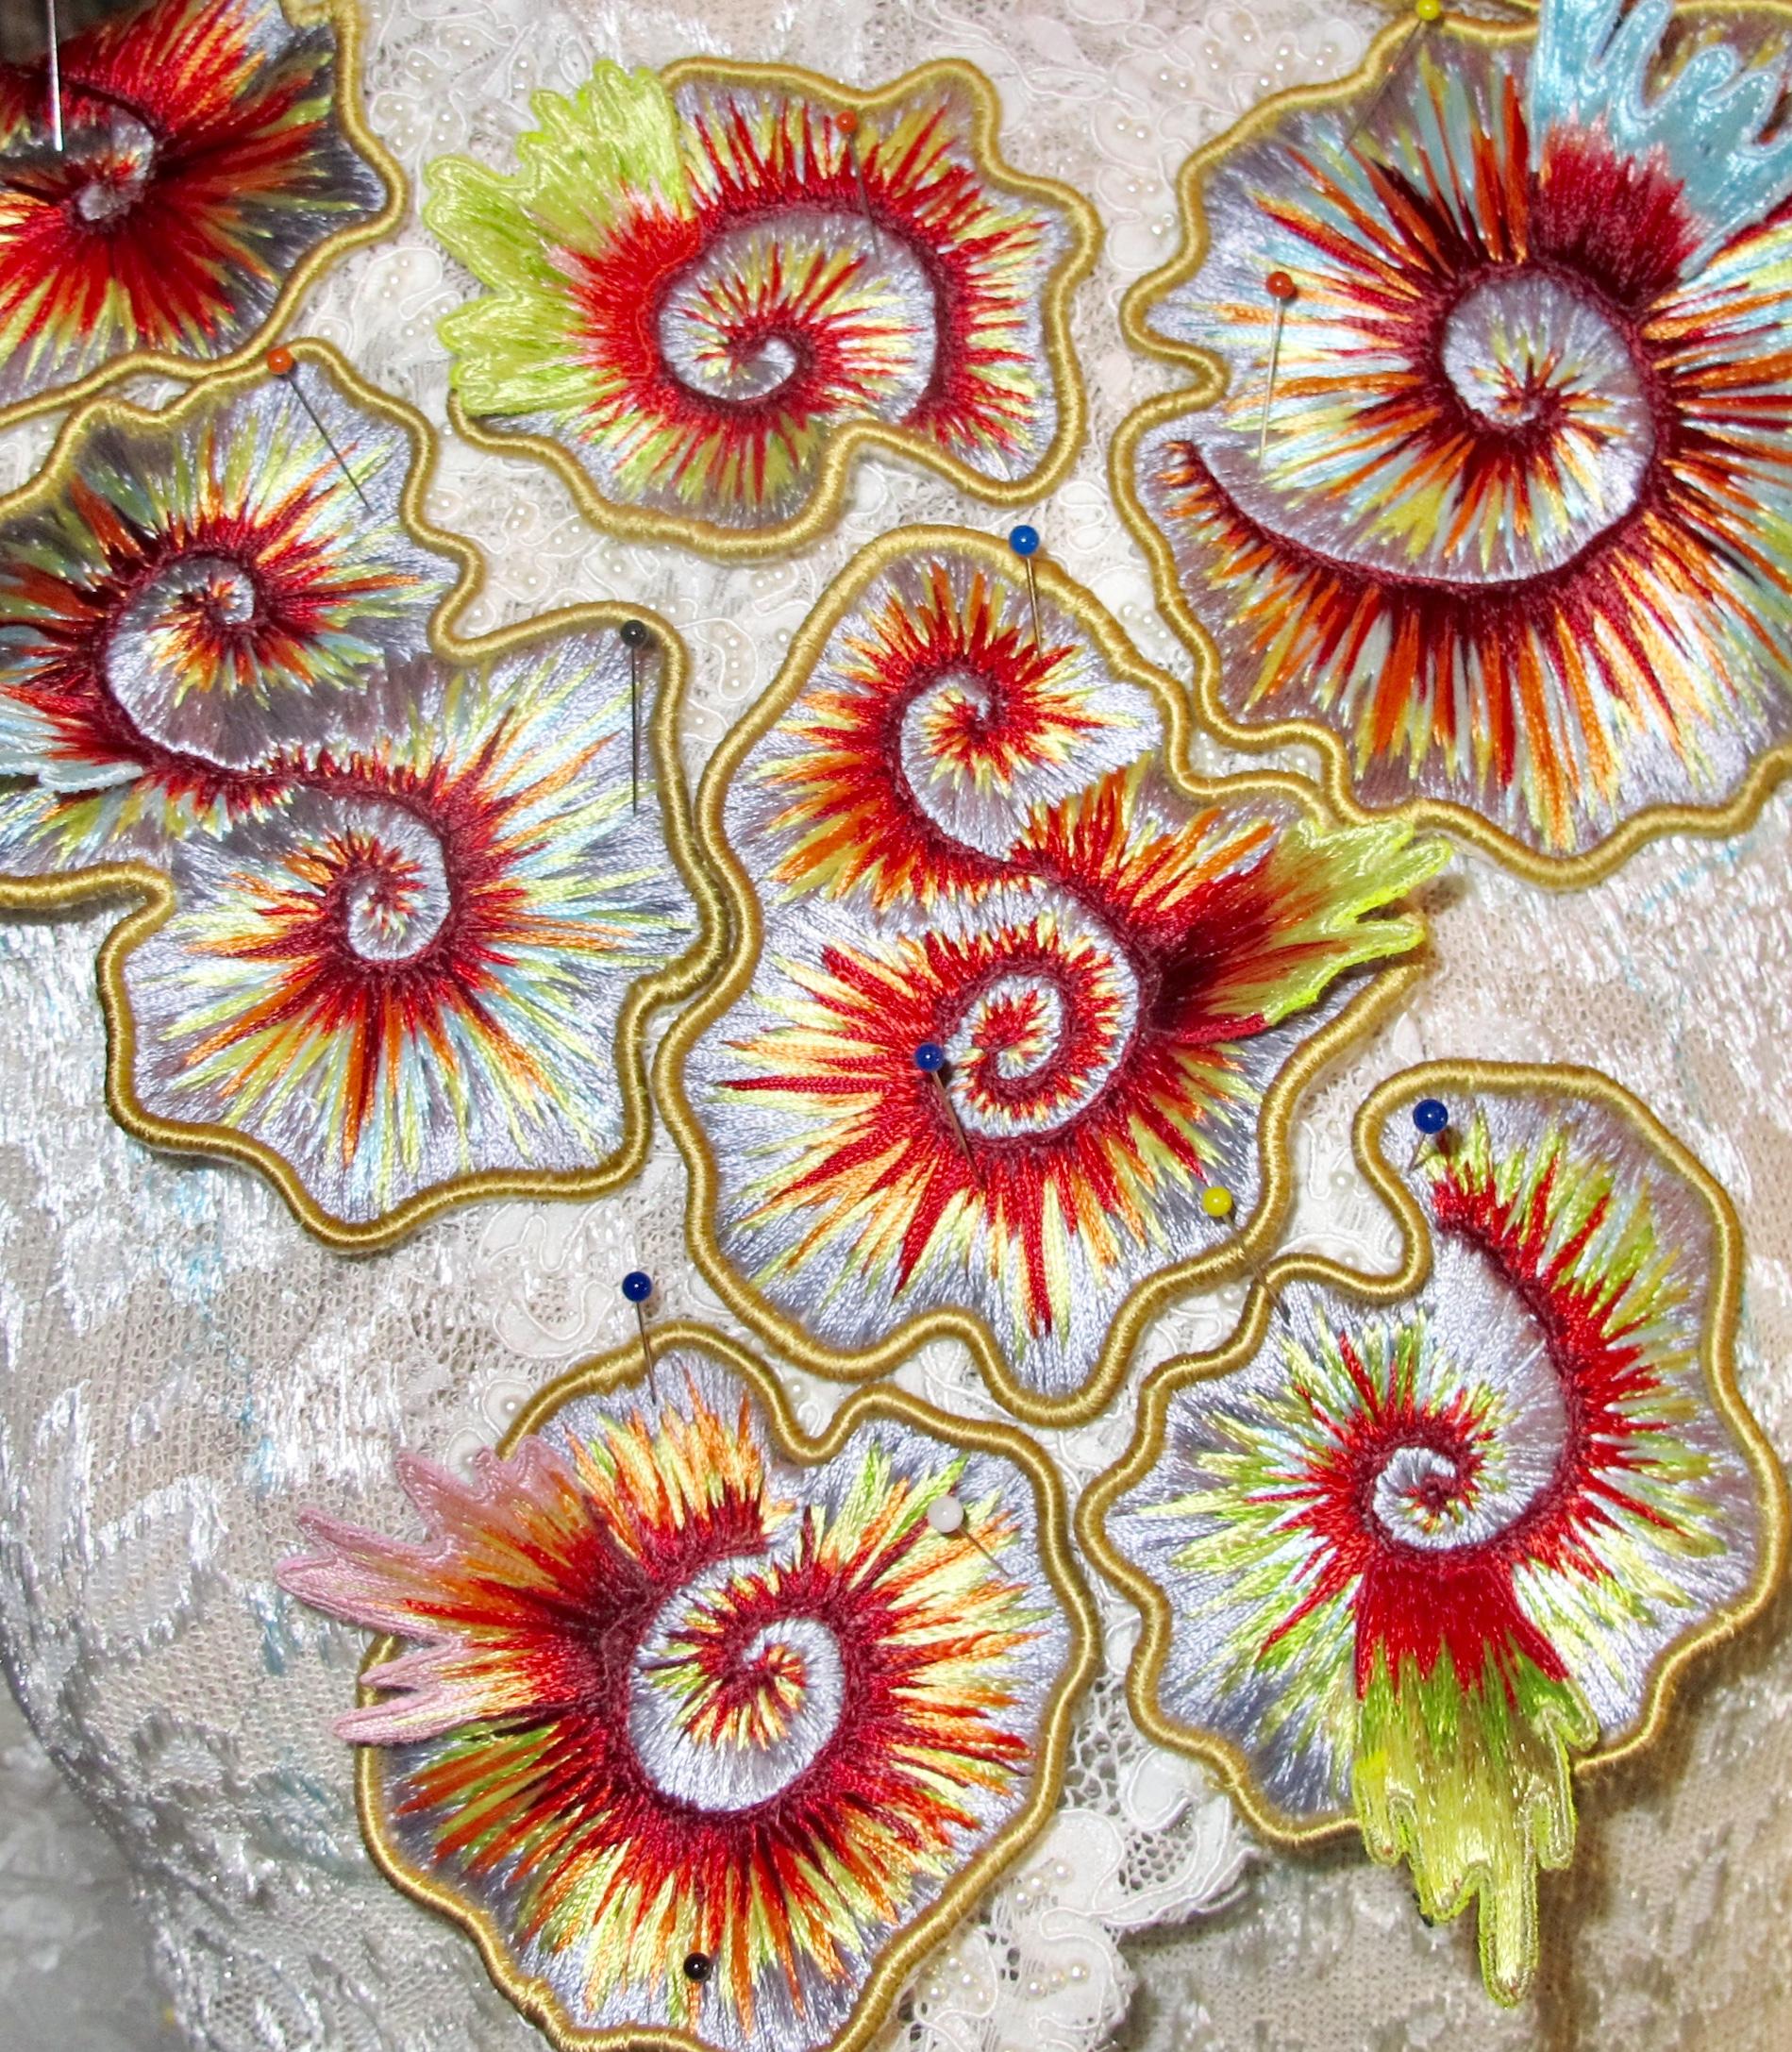 Hand embroidery samples, 2015. Ania Zoltkowski.